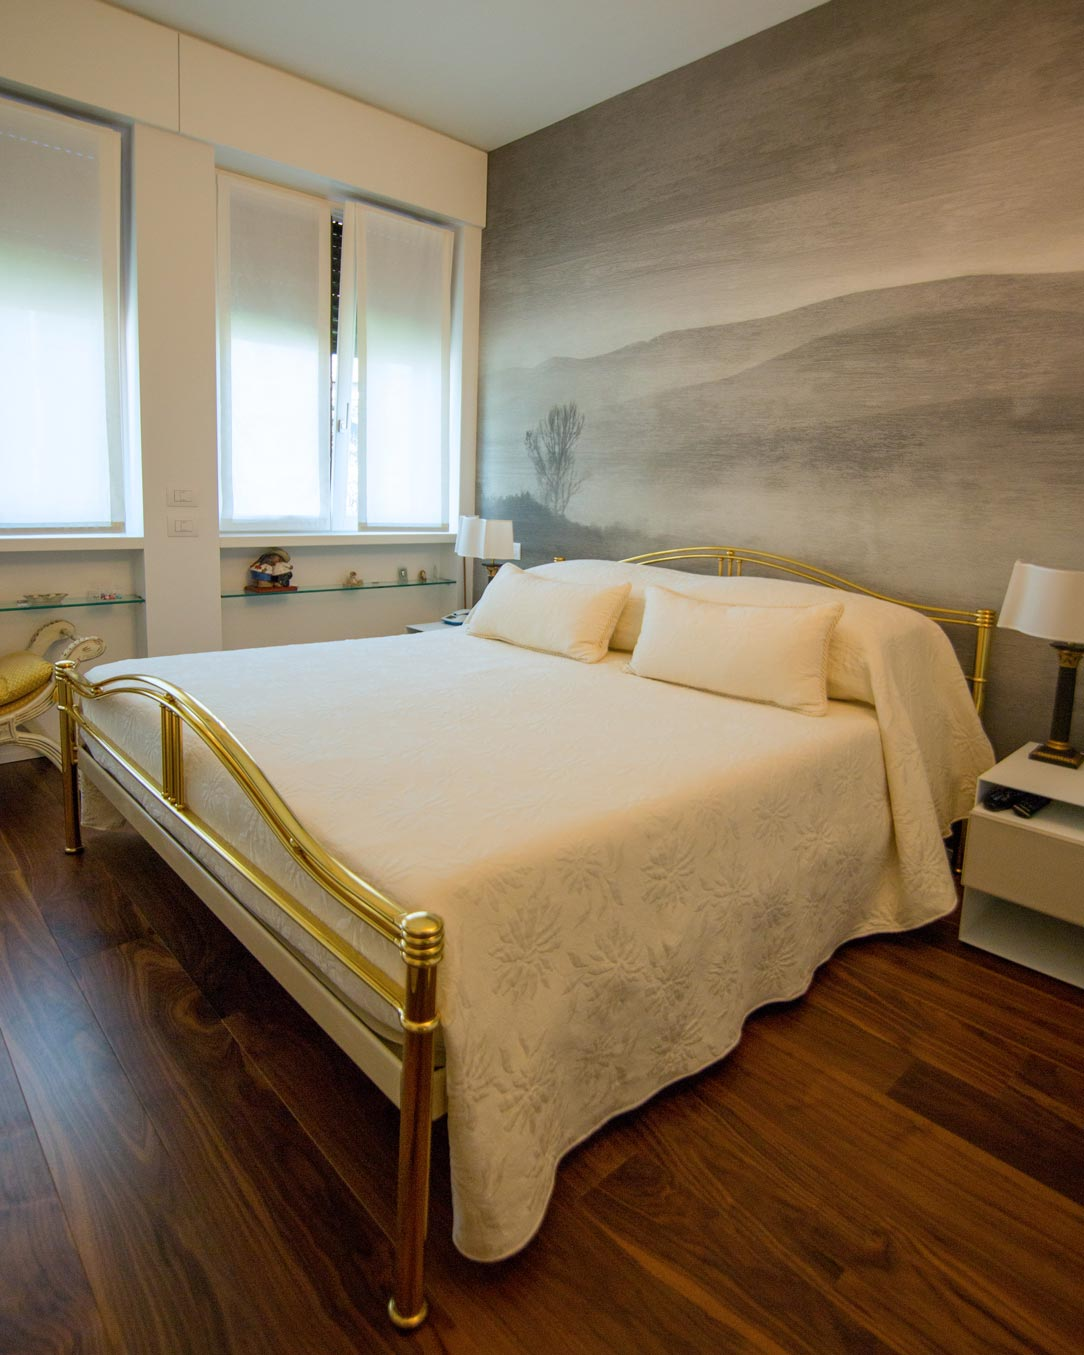 Appartamento Milano camera 02